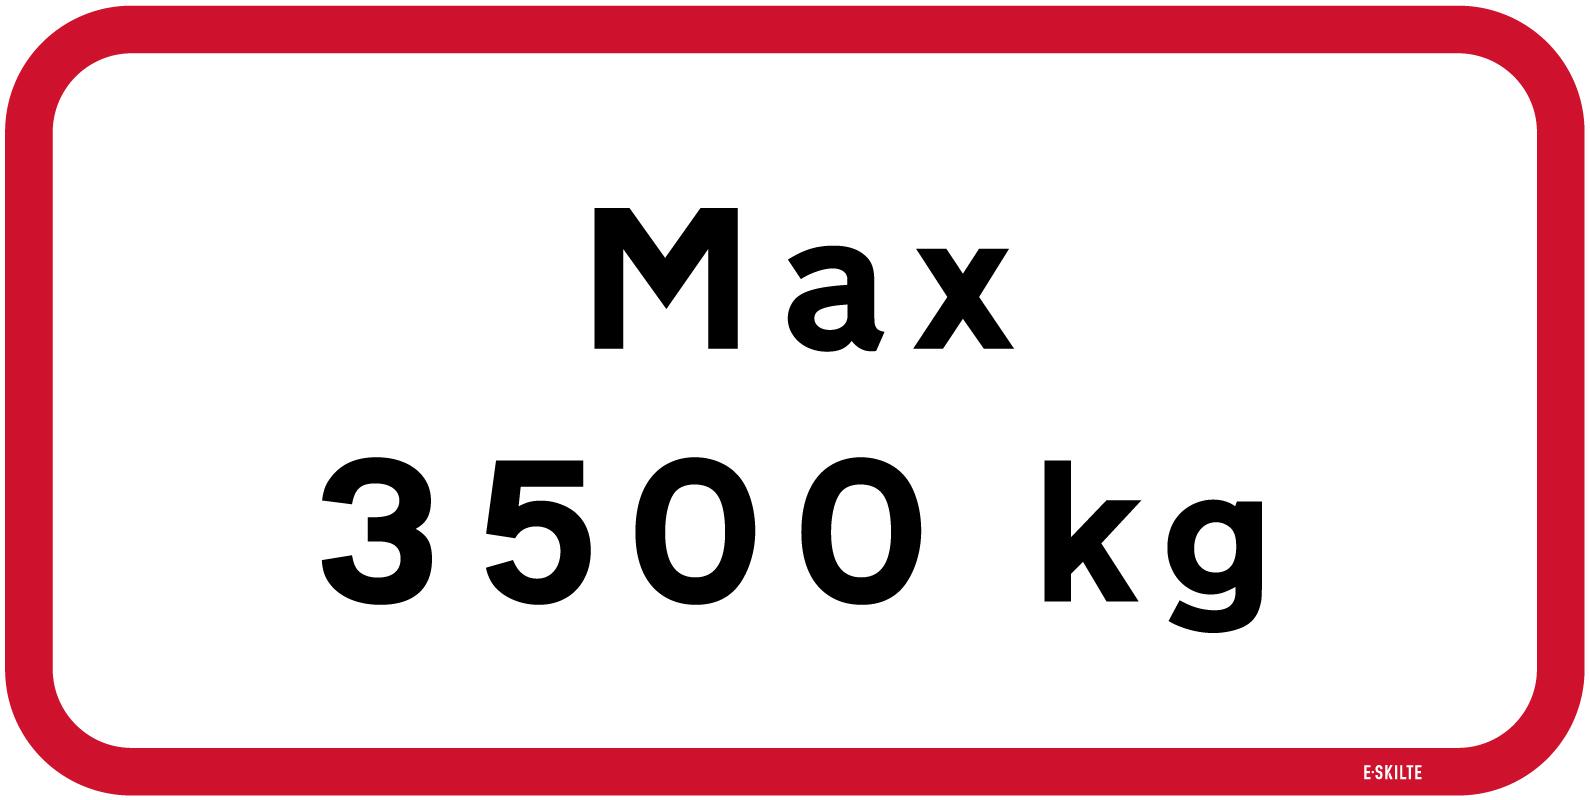 Max 3500 kg skilt